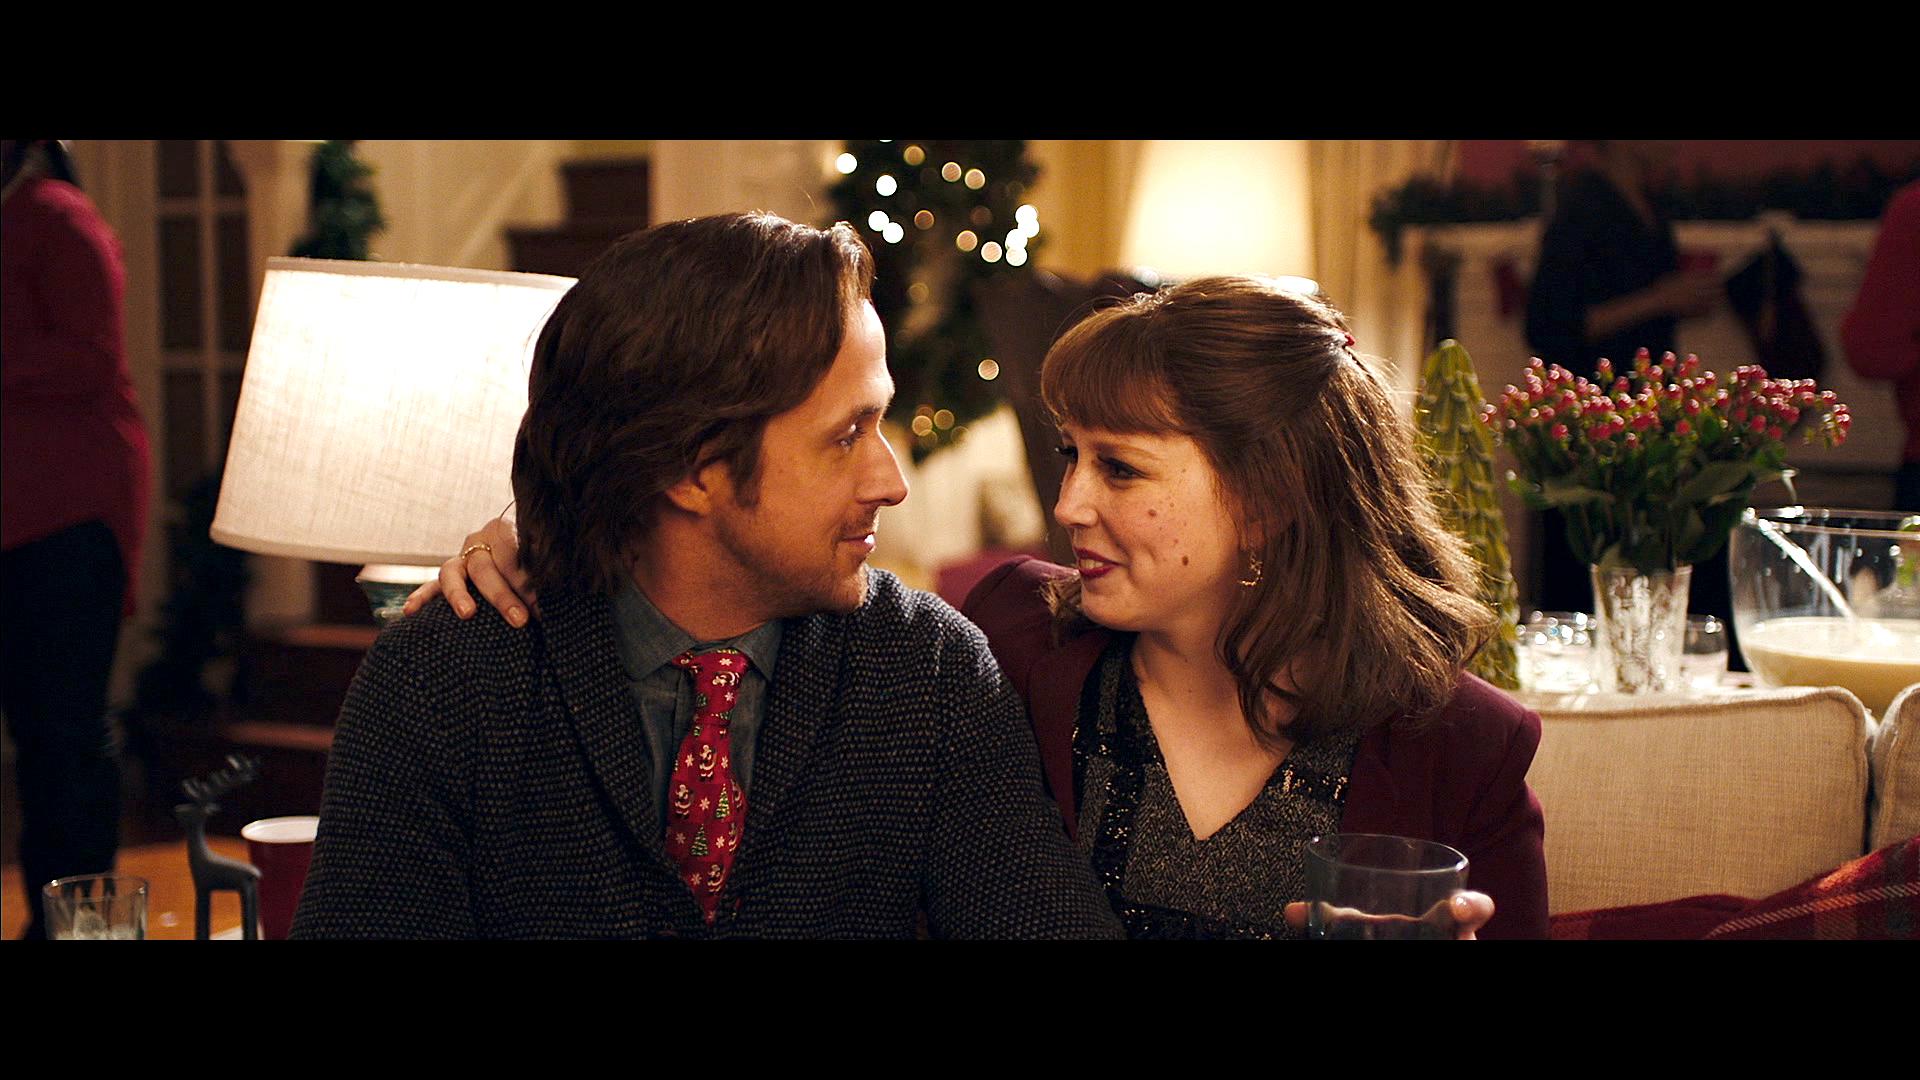 Watch Santa Baby From Saturday Night Live - NBC.com